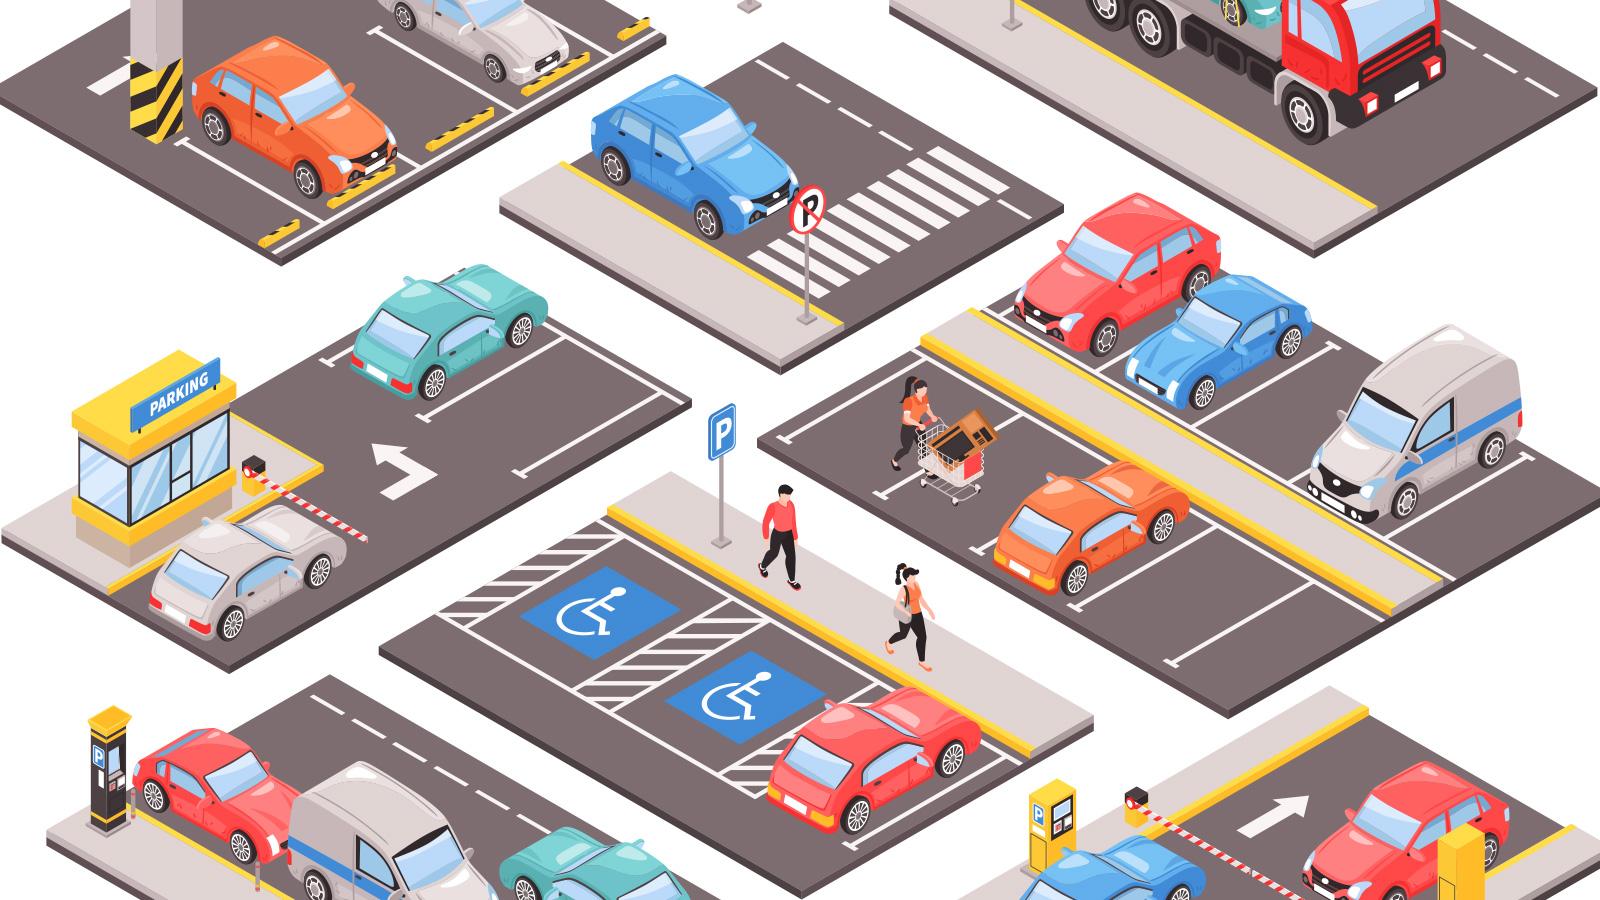 【PR】駐車場シェア「軒先パーキング」と連携いたしました